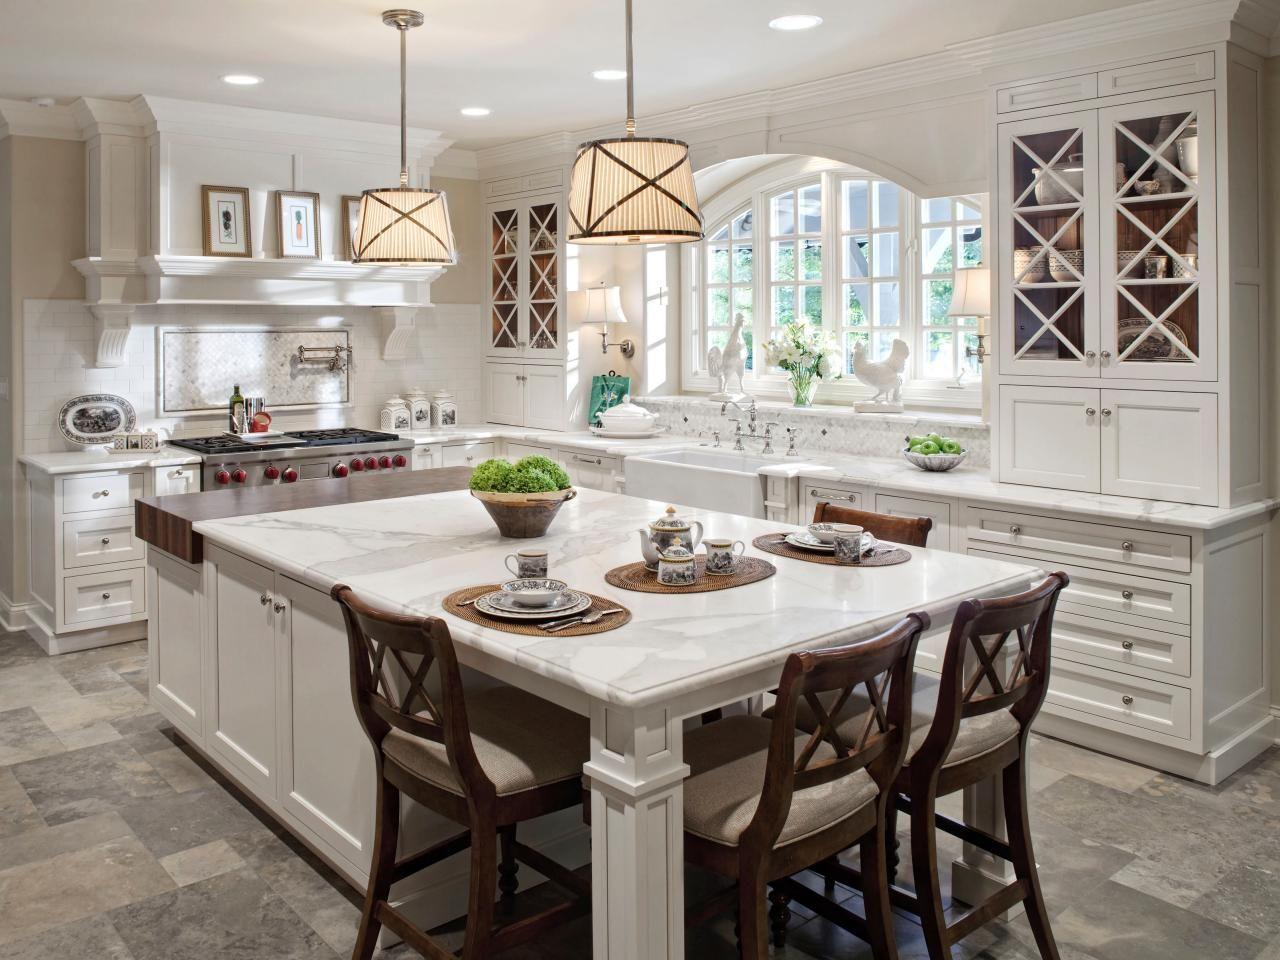 Timeless Kitchen Design - http://www.dreheydra.com/1156/timeless-kitchen-design #homeideas #homedesign #homedecor